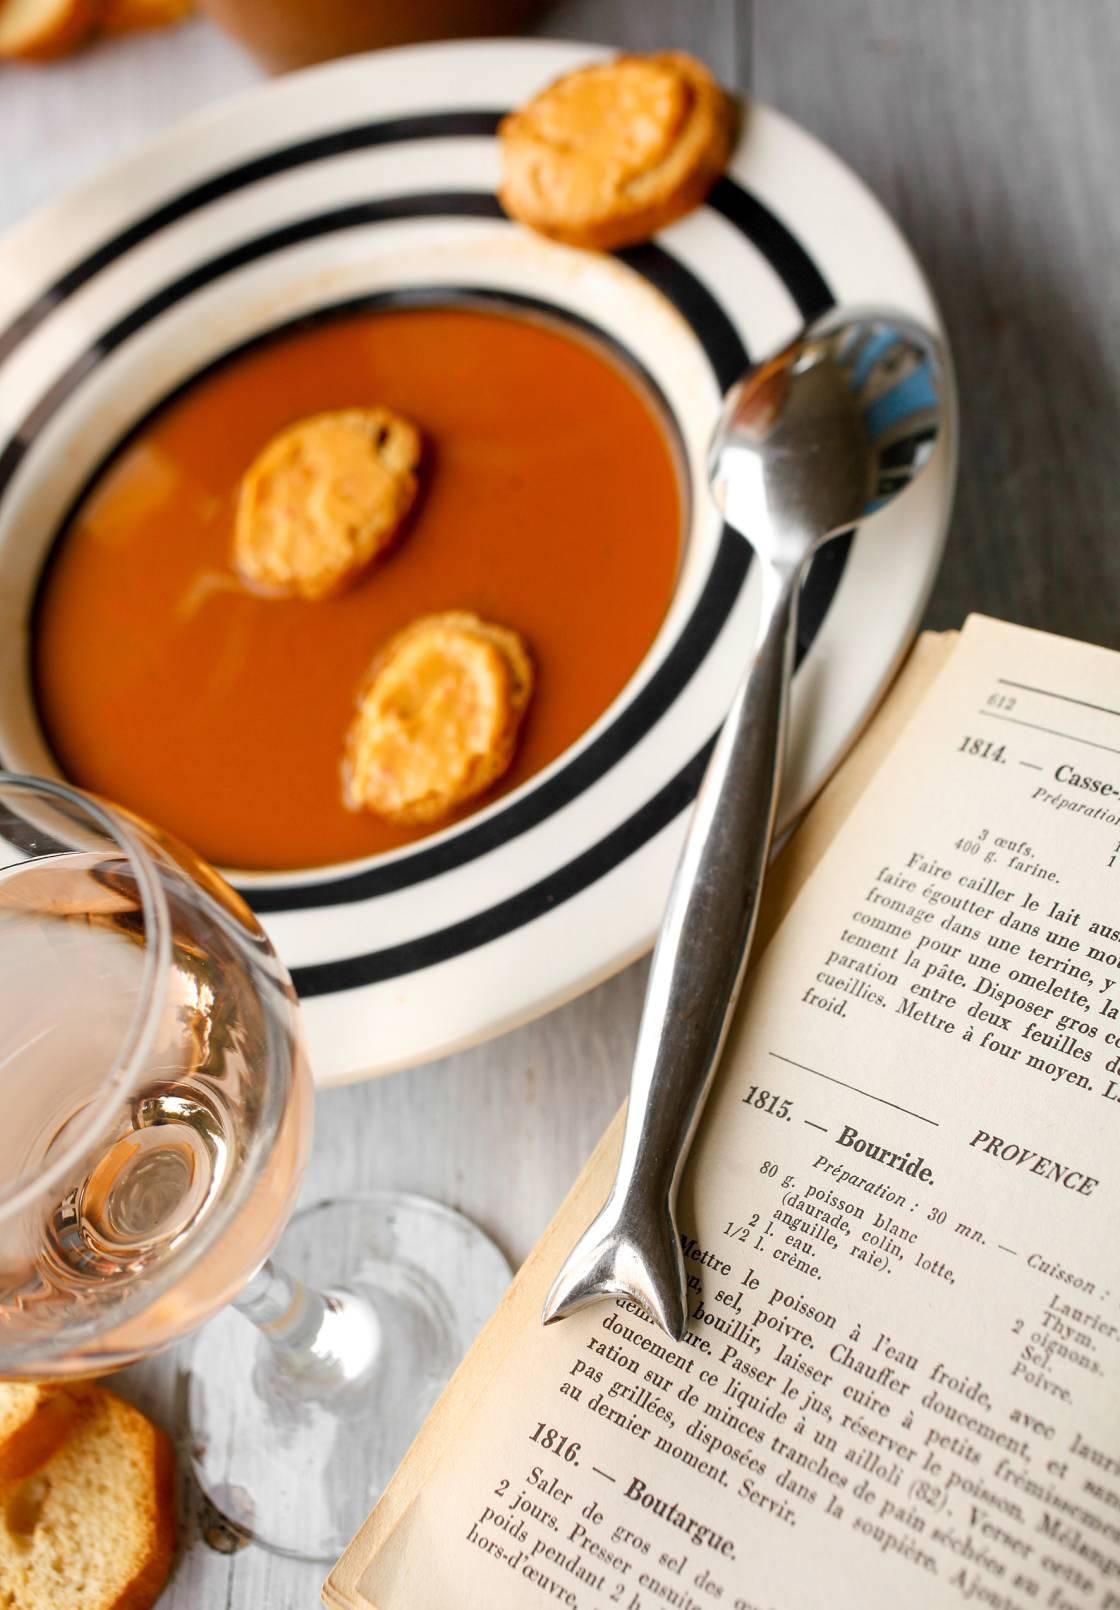 Cuisine Provencale Blanche Et Bleue gastronomy in provence: seafood, the staple of provençal cuisine